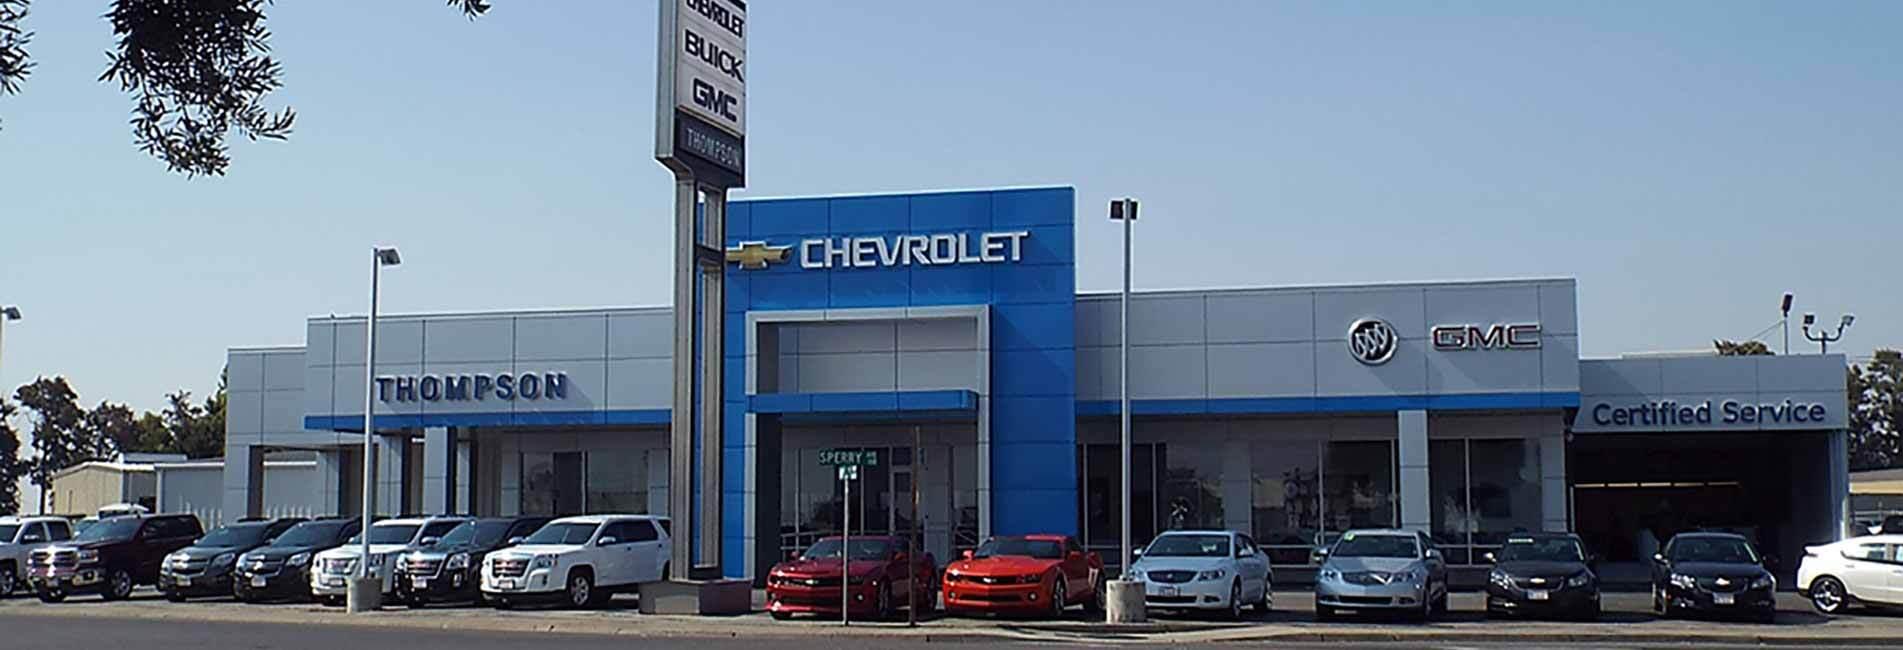 Thompson Chevrolet Patterson Ca Upcomingcarshq Com